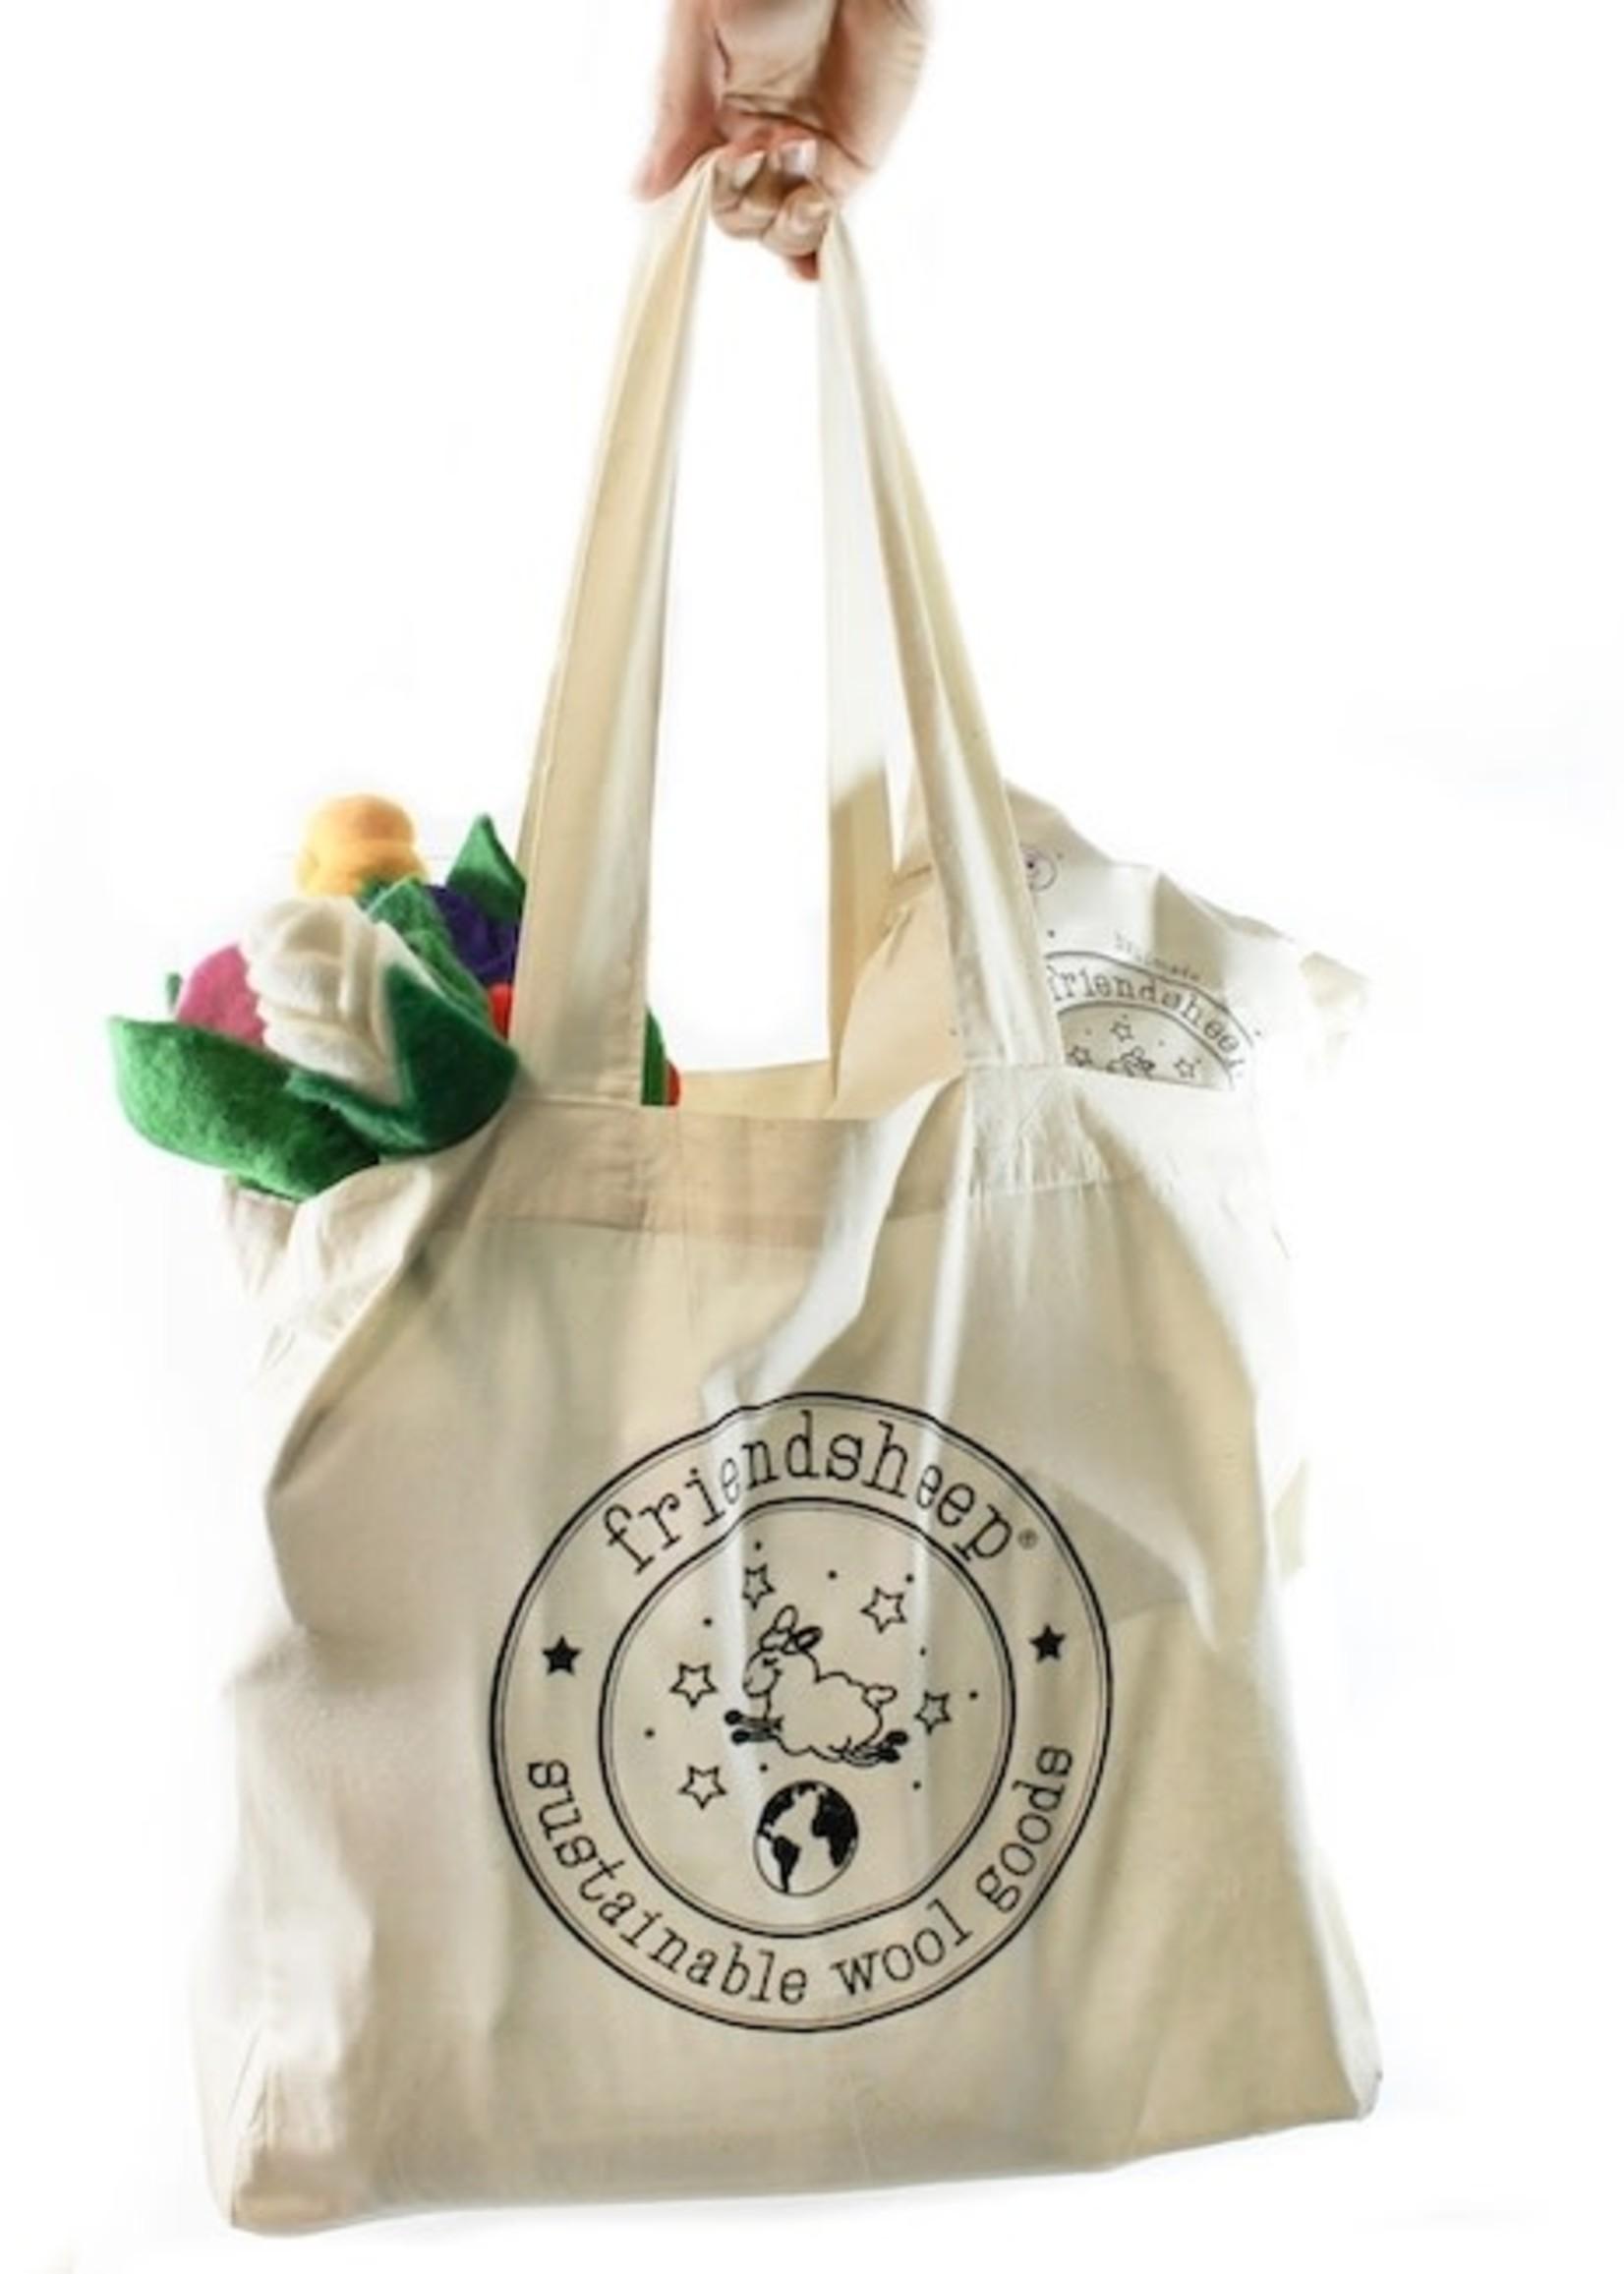 Friendsheep One Less Plastic Bag